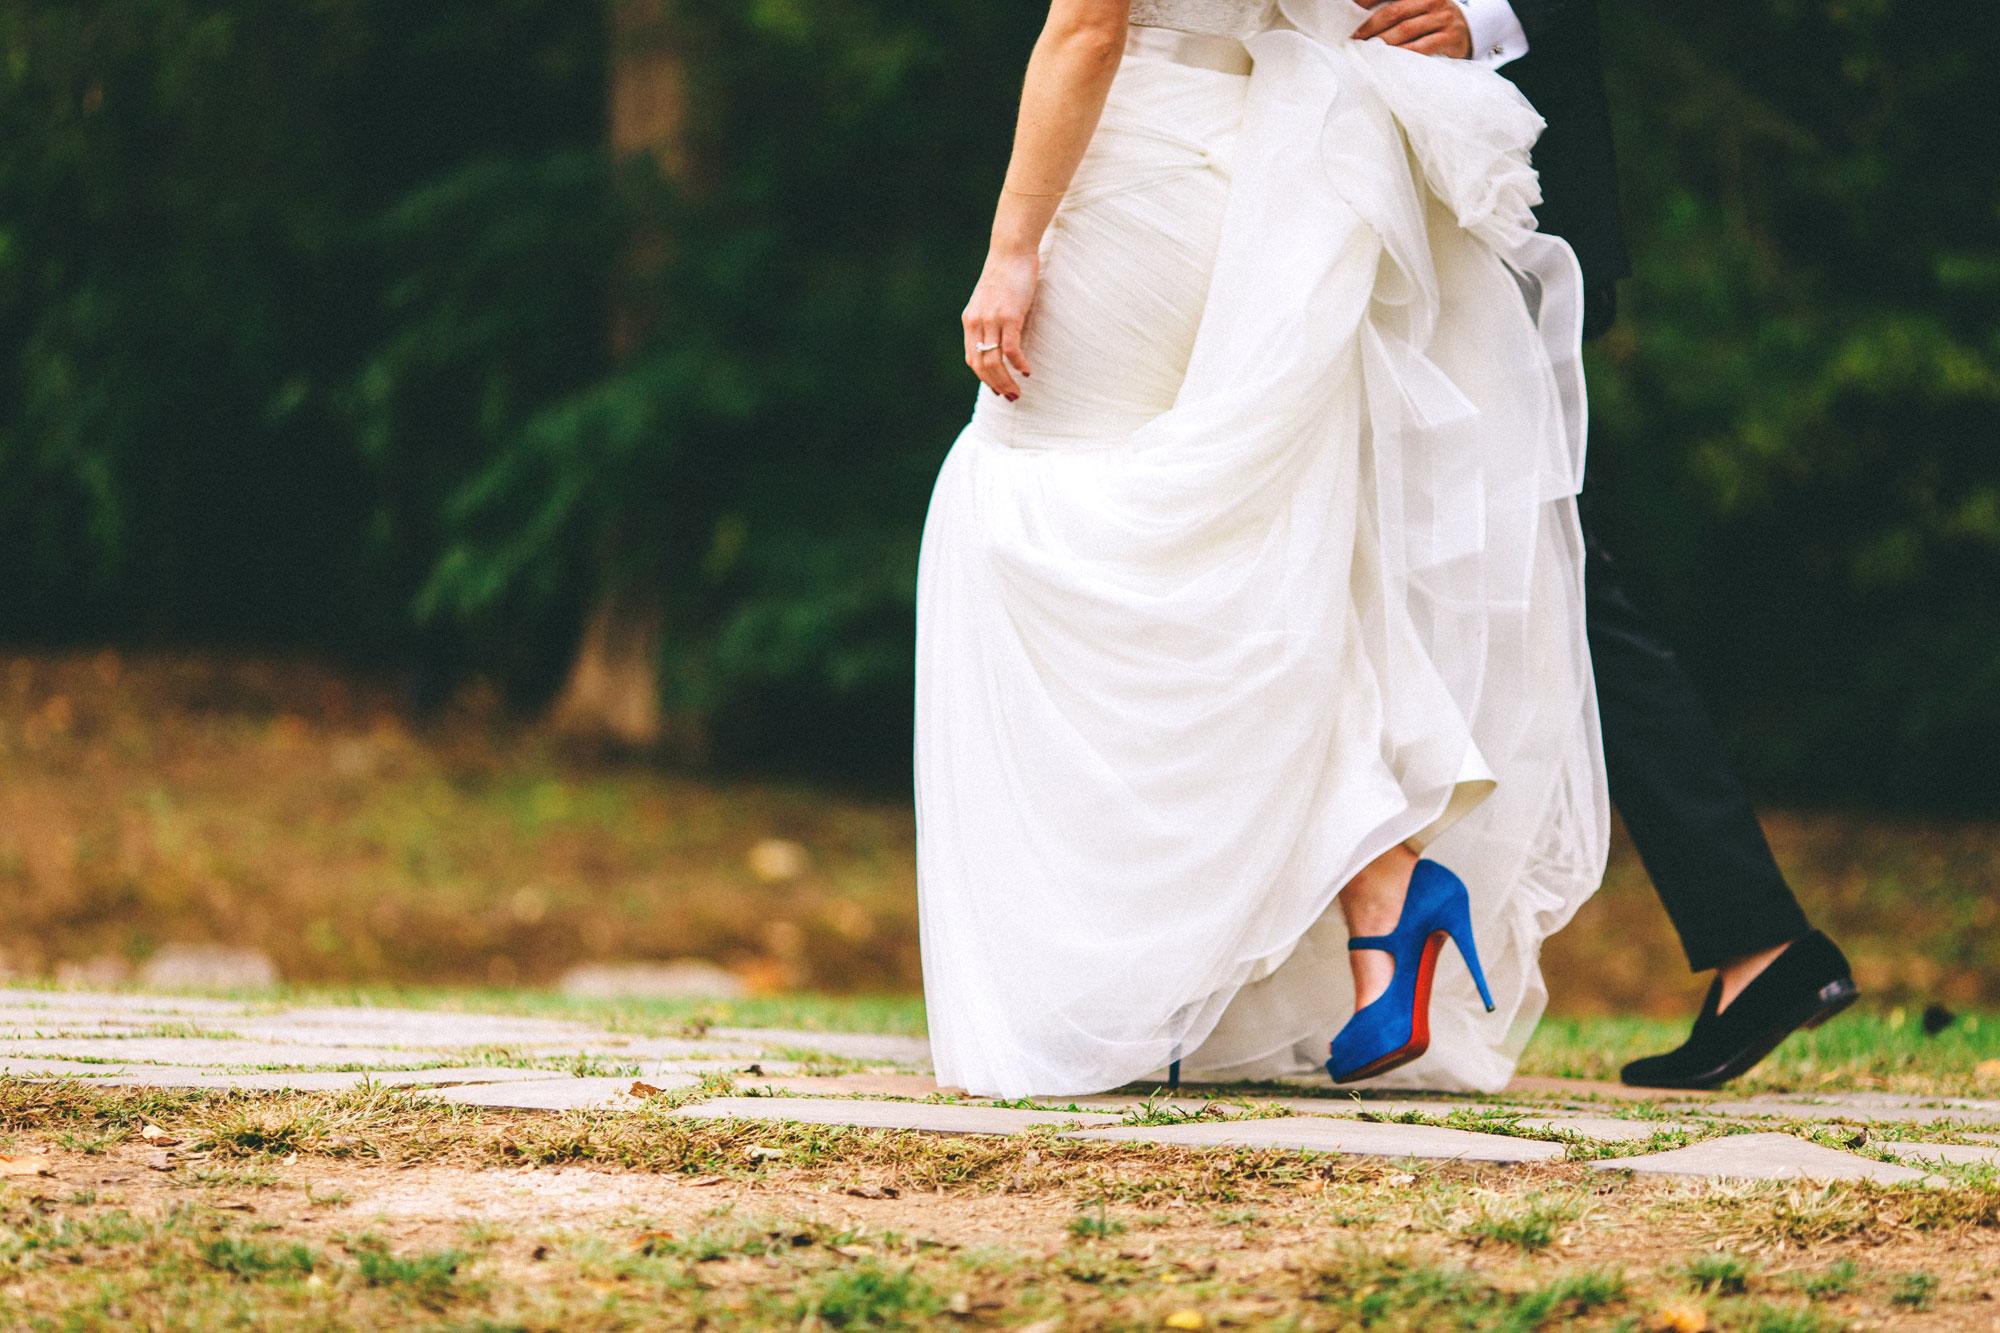 Me & Mr. Jones Wedding, Blue Wedding Shoes, Christian Louboutin Wedding Shoes, Magnanni Slippers, Black Tie Wedding, Cedarwood Wedding, Nashville Wedding